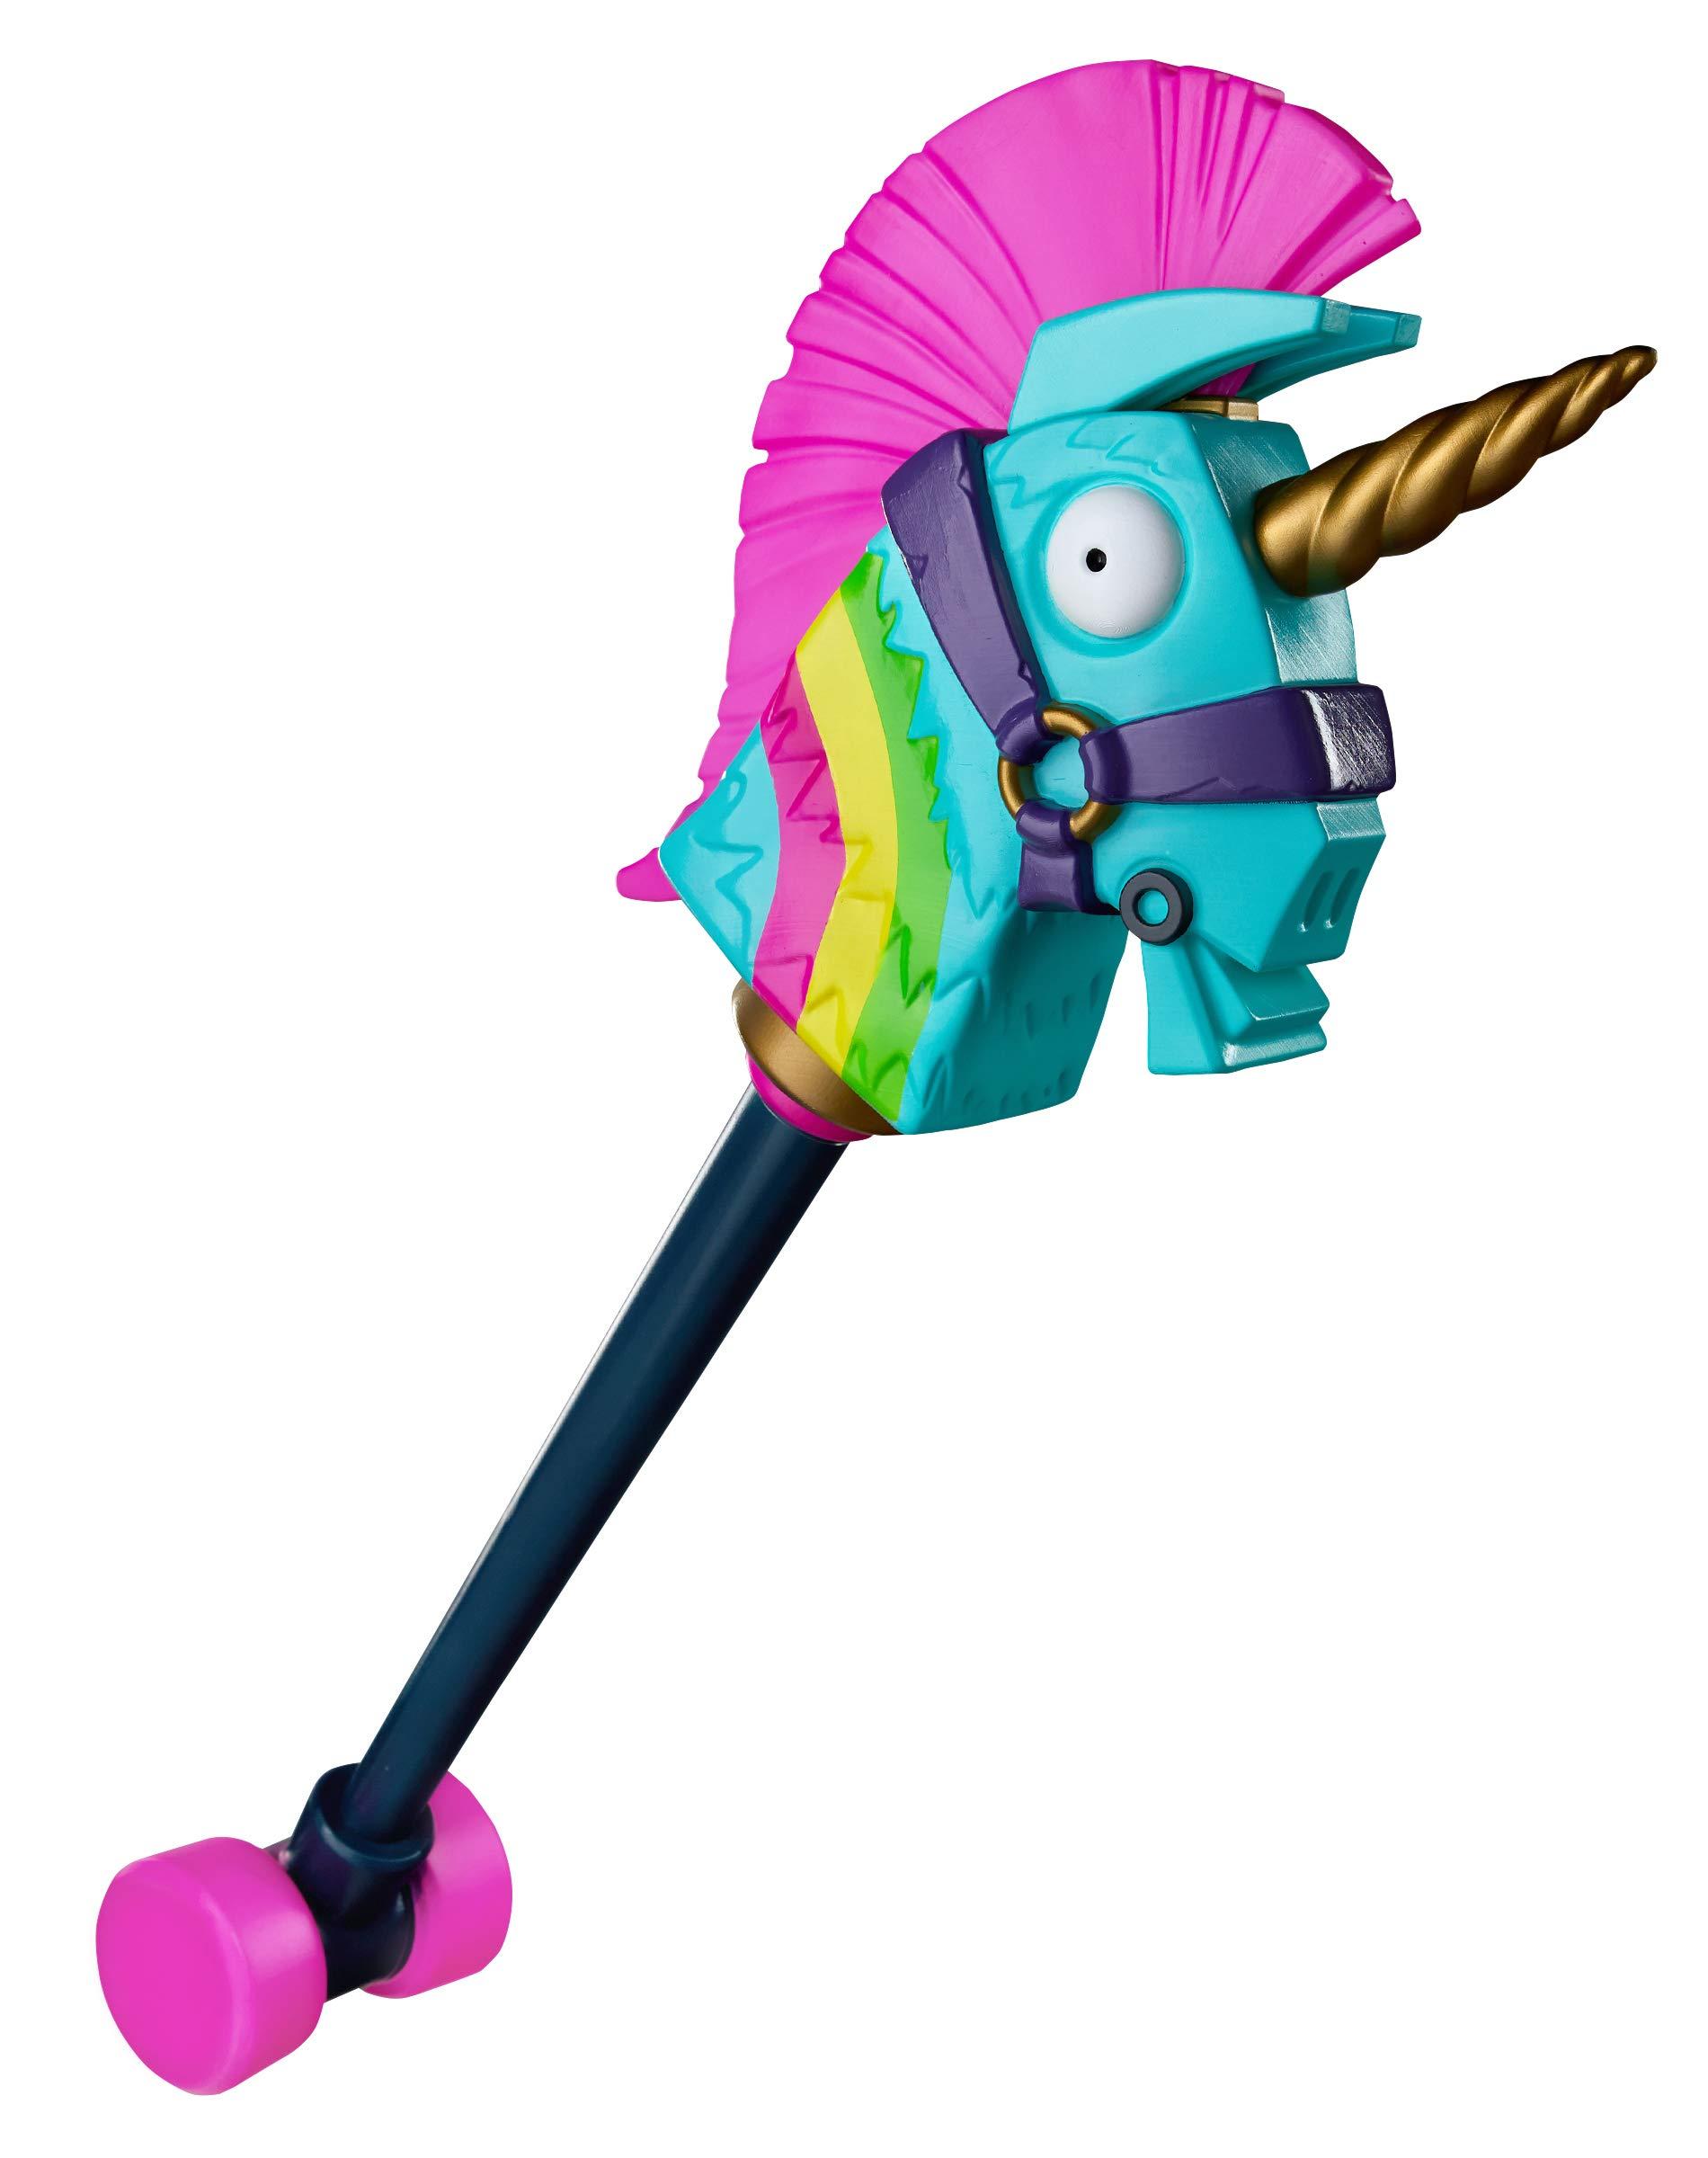 Spirit Halloween Fortnite Rainbow Smash Pickaxe by Spirit Halloween